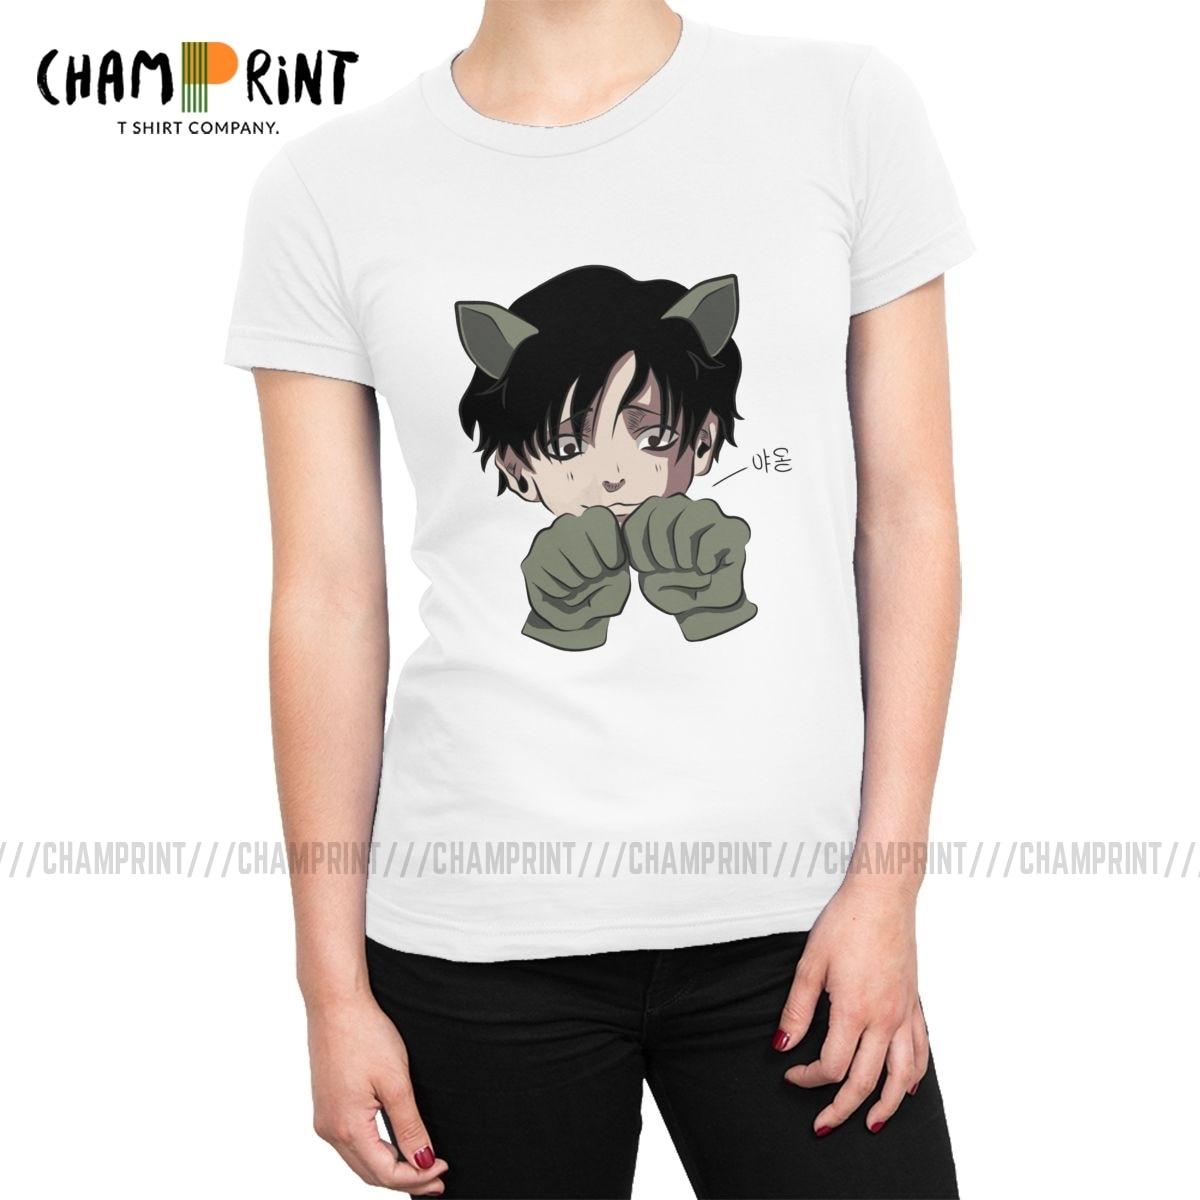 Yoon vagabundo gato matando perseguindo camisetas femininas yoonbum coreano yaoi manga moda tshirt lazer impresso roupas para o sexo feminino